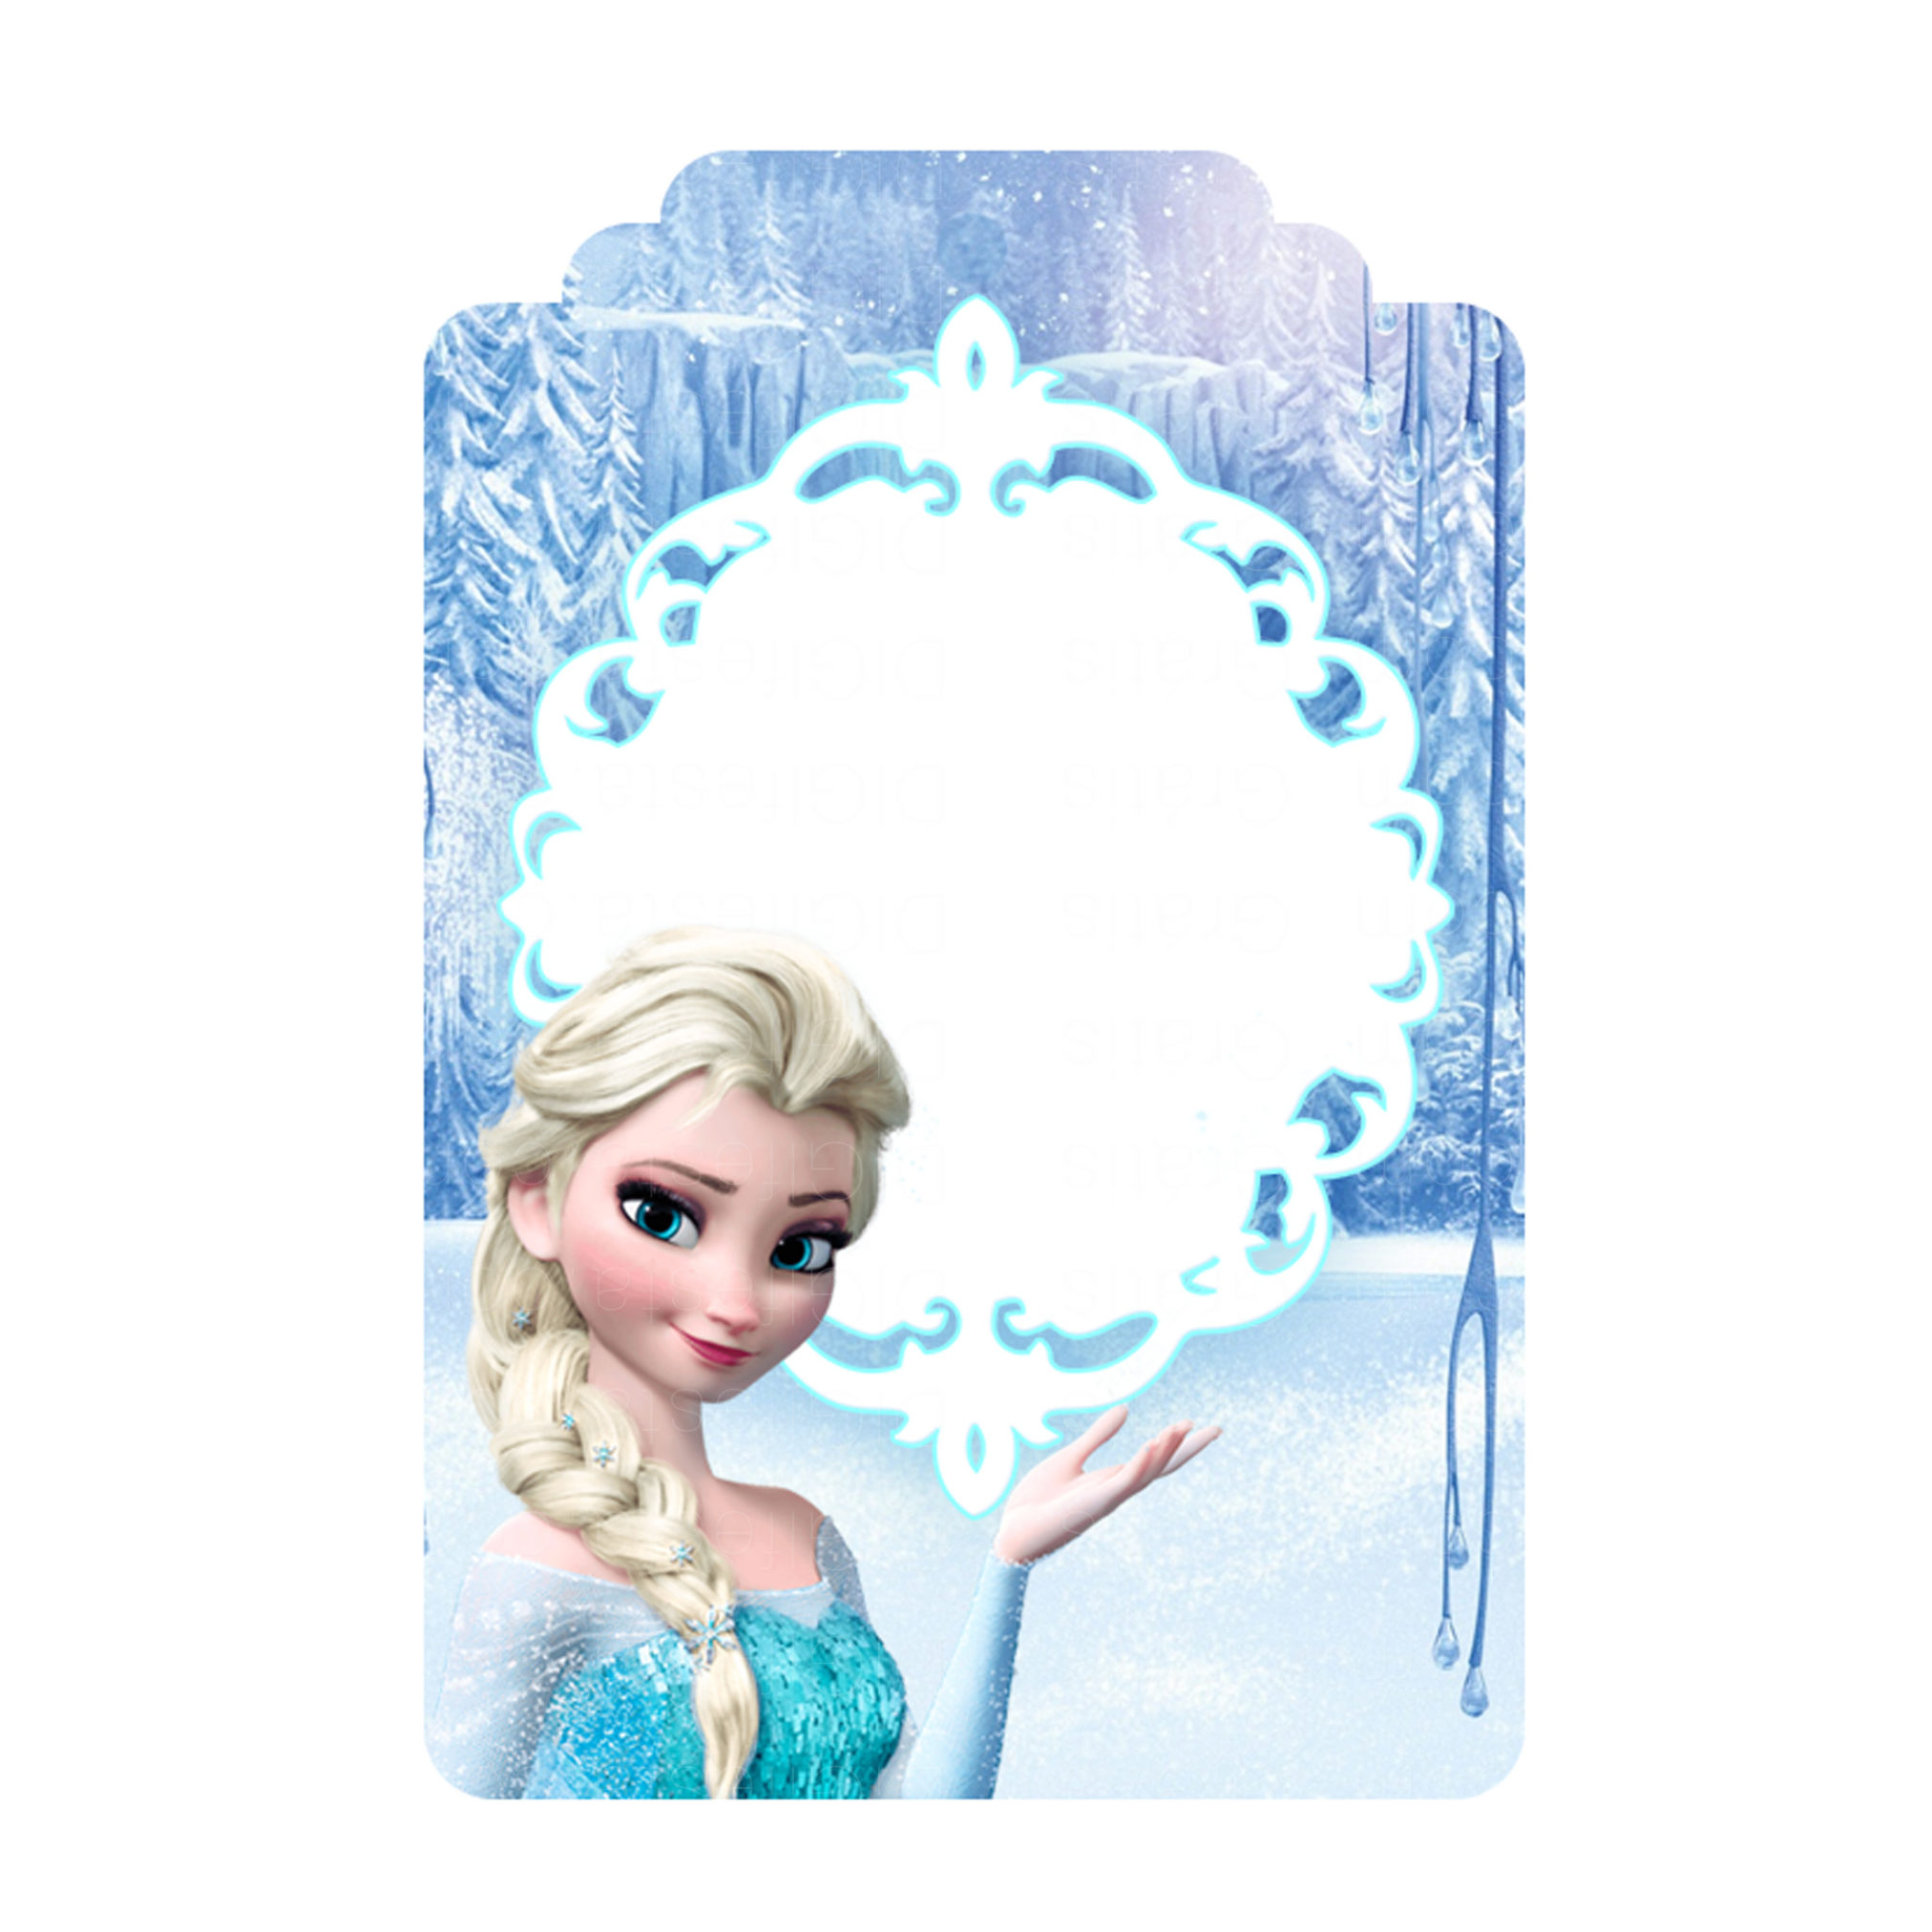 Tag Frozen Grátis